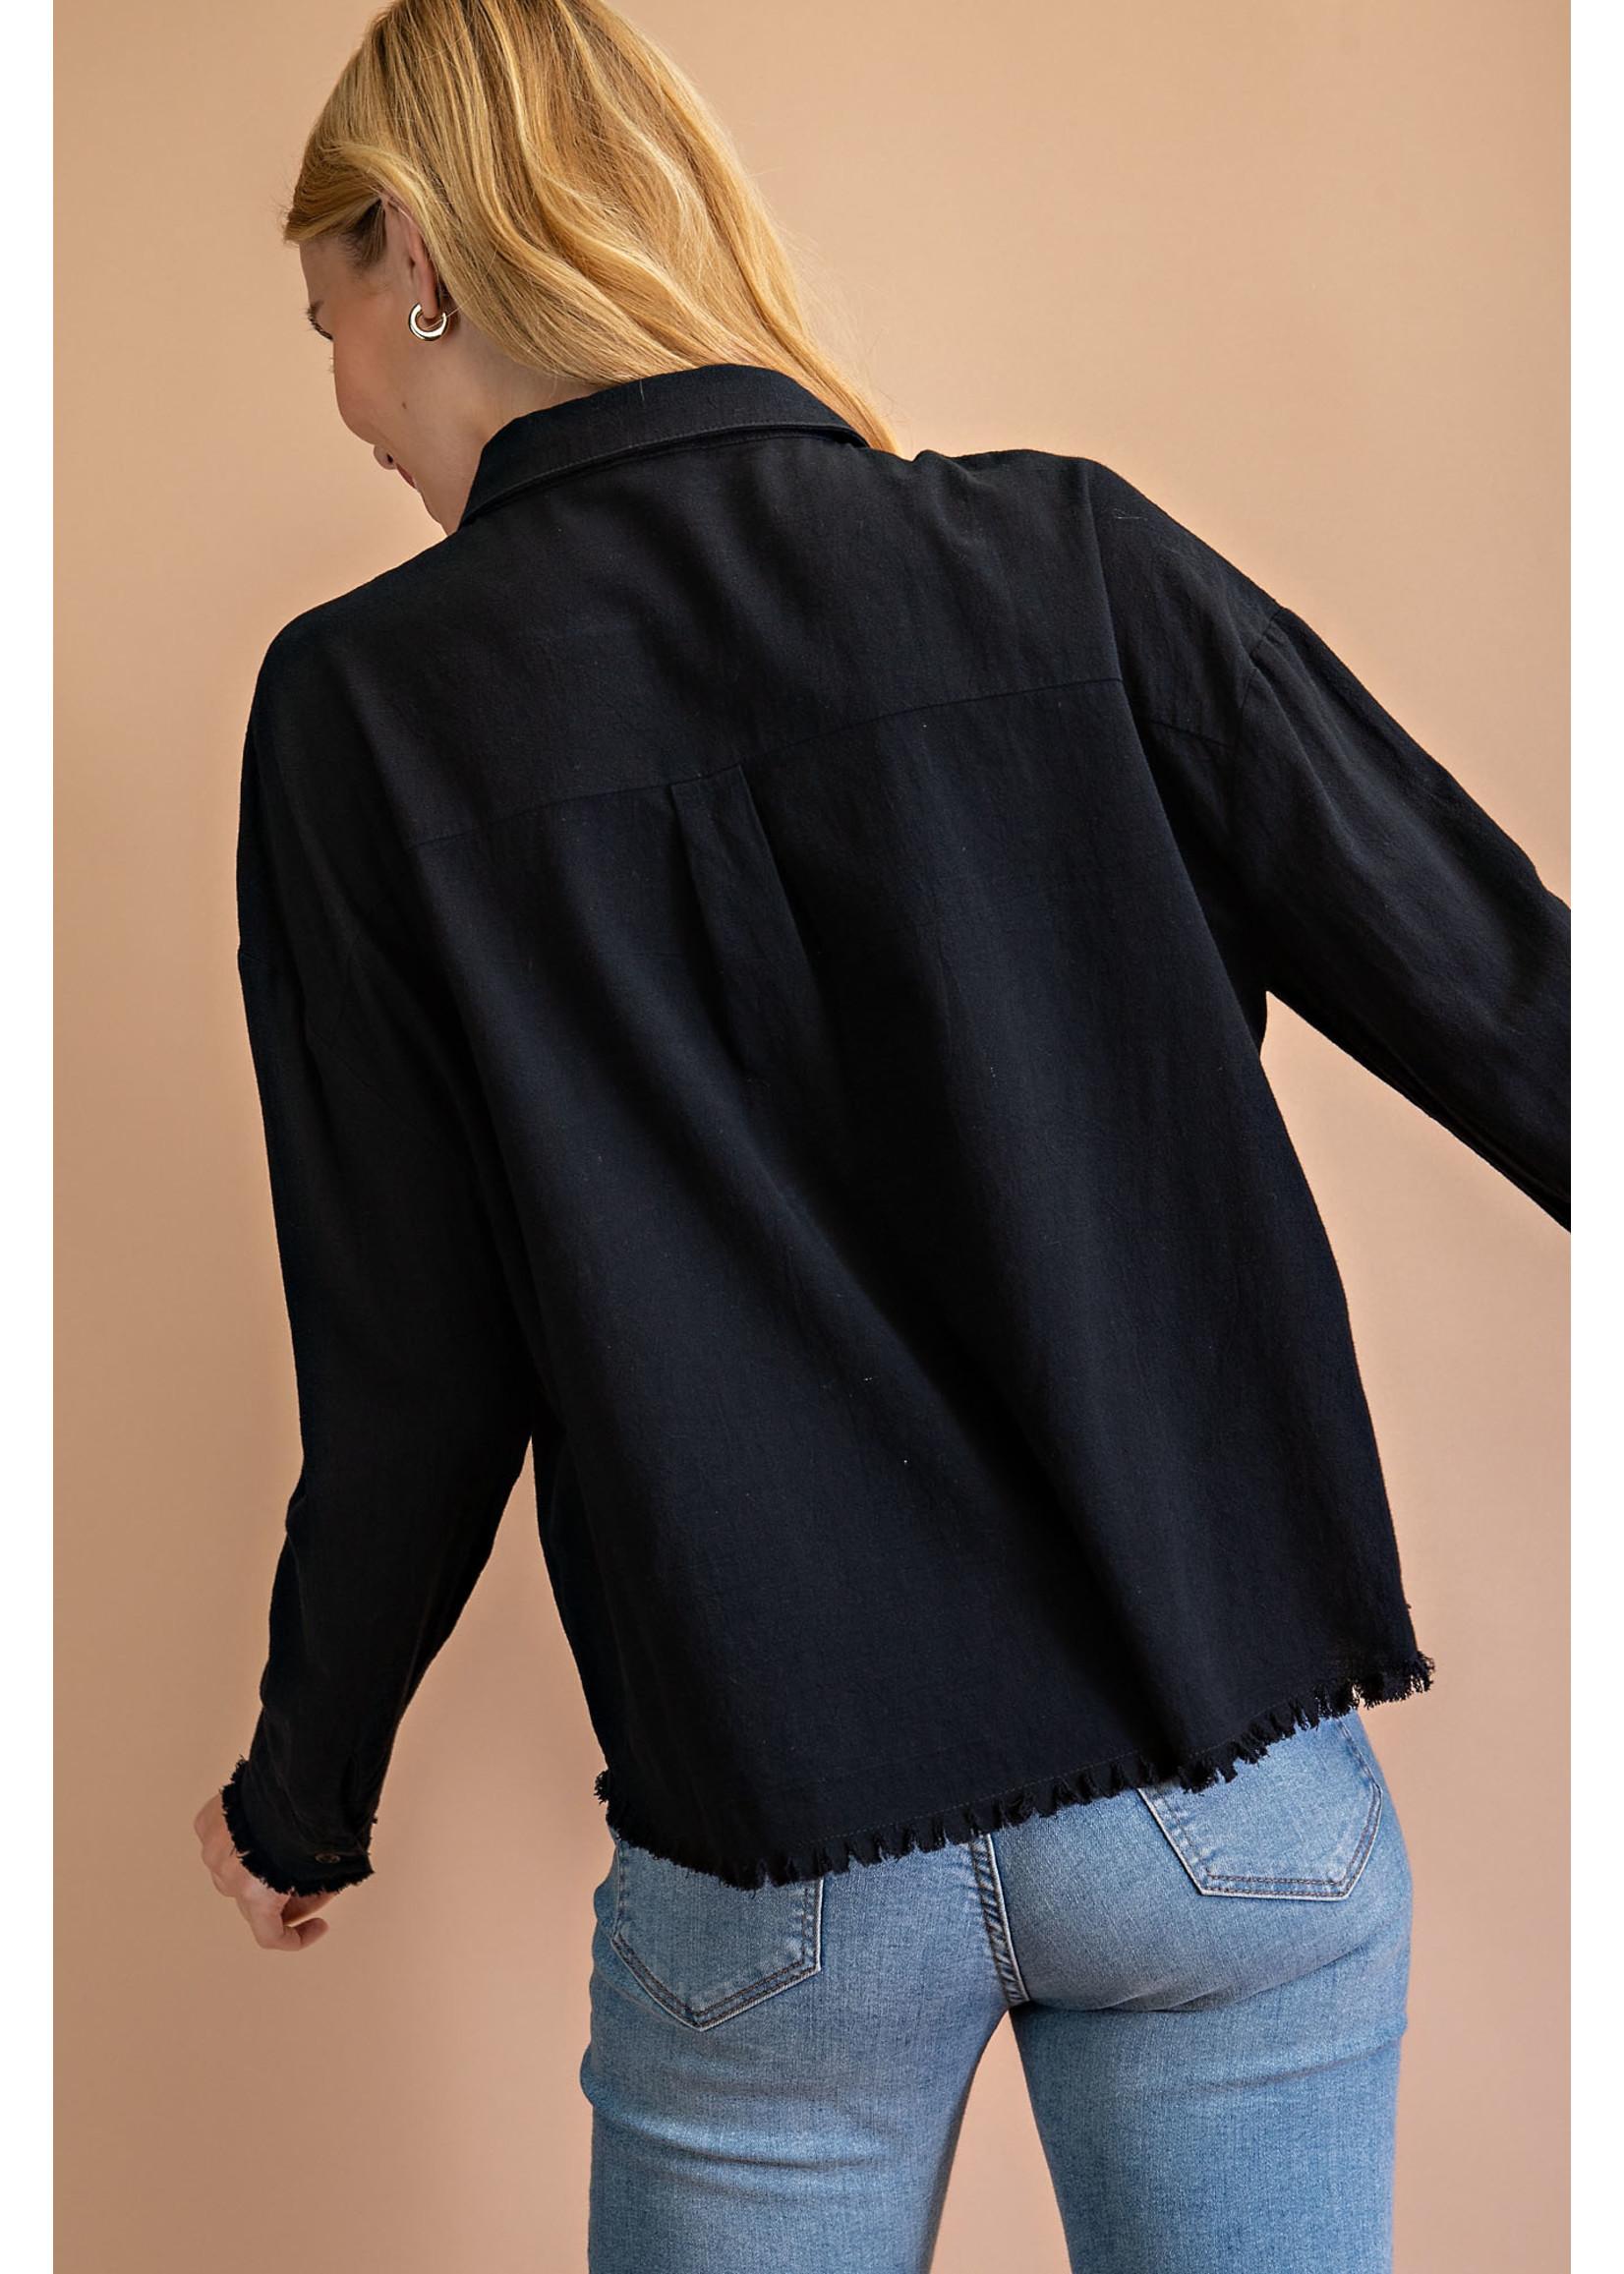 L Love Long Sleeve Frayed Dress Shirt